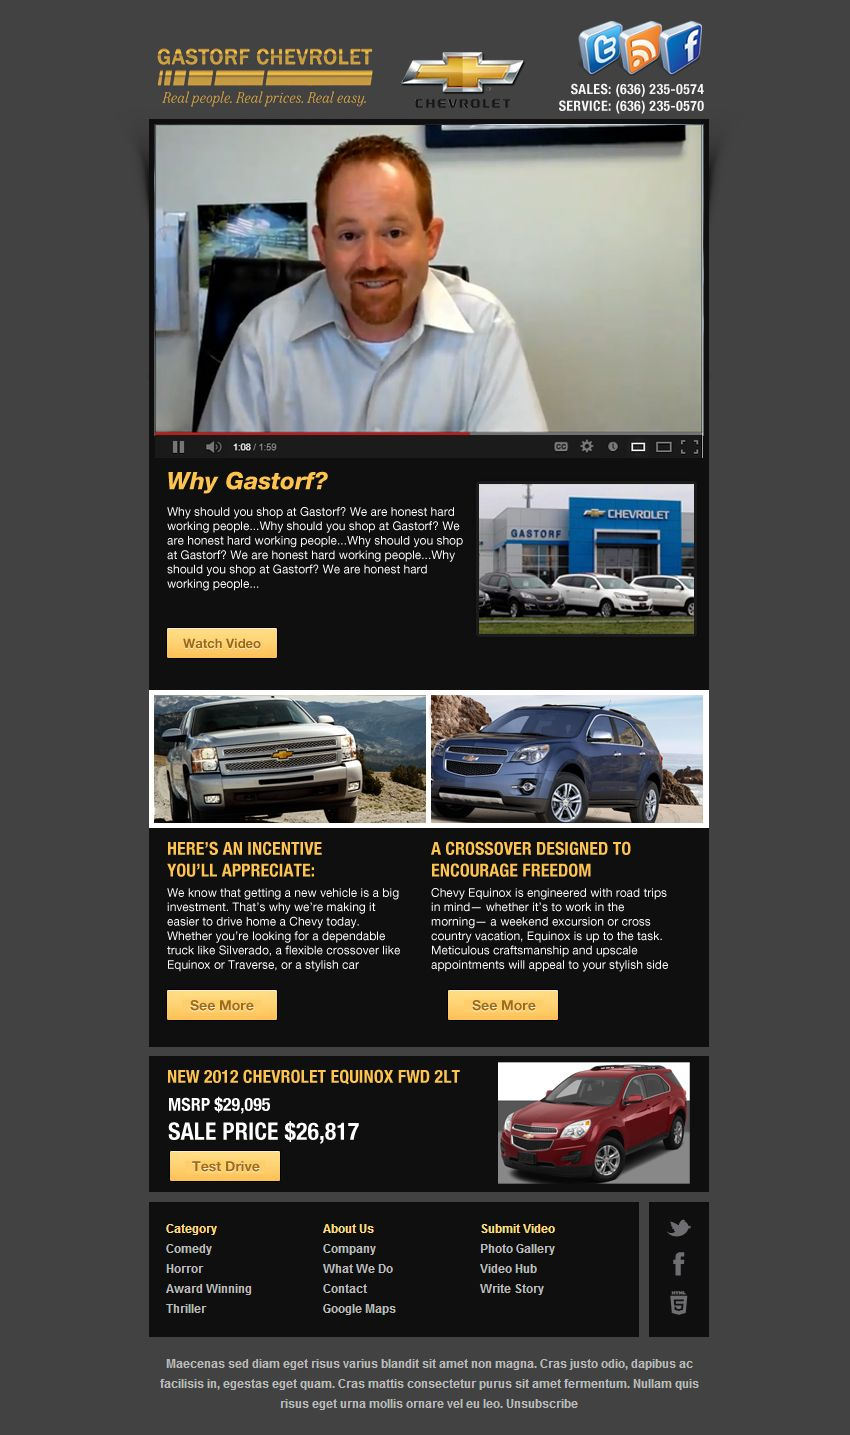 Gastorf Chevrolet Email Marketing Mockup